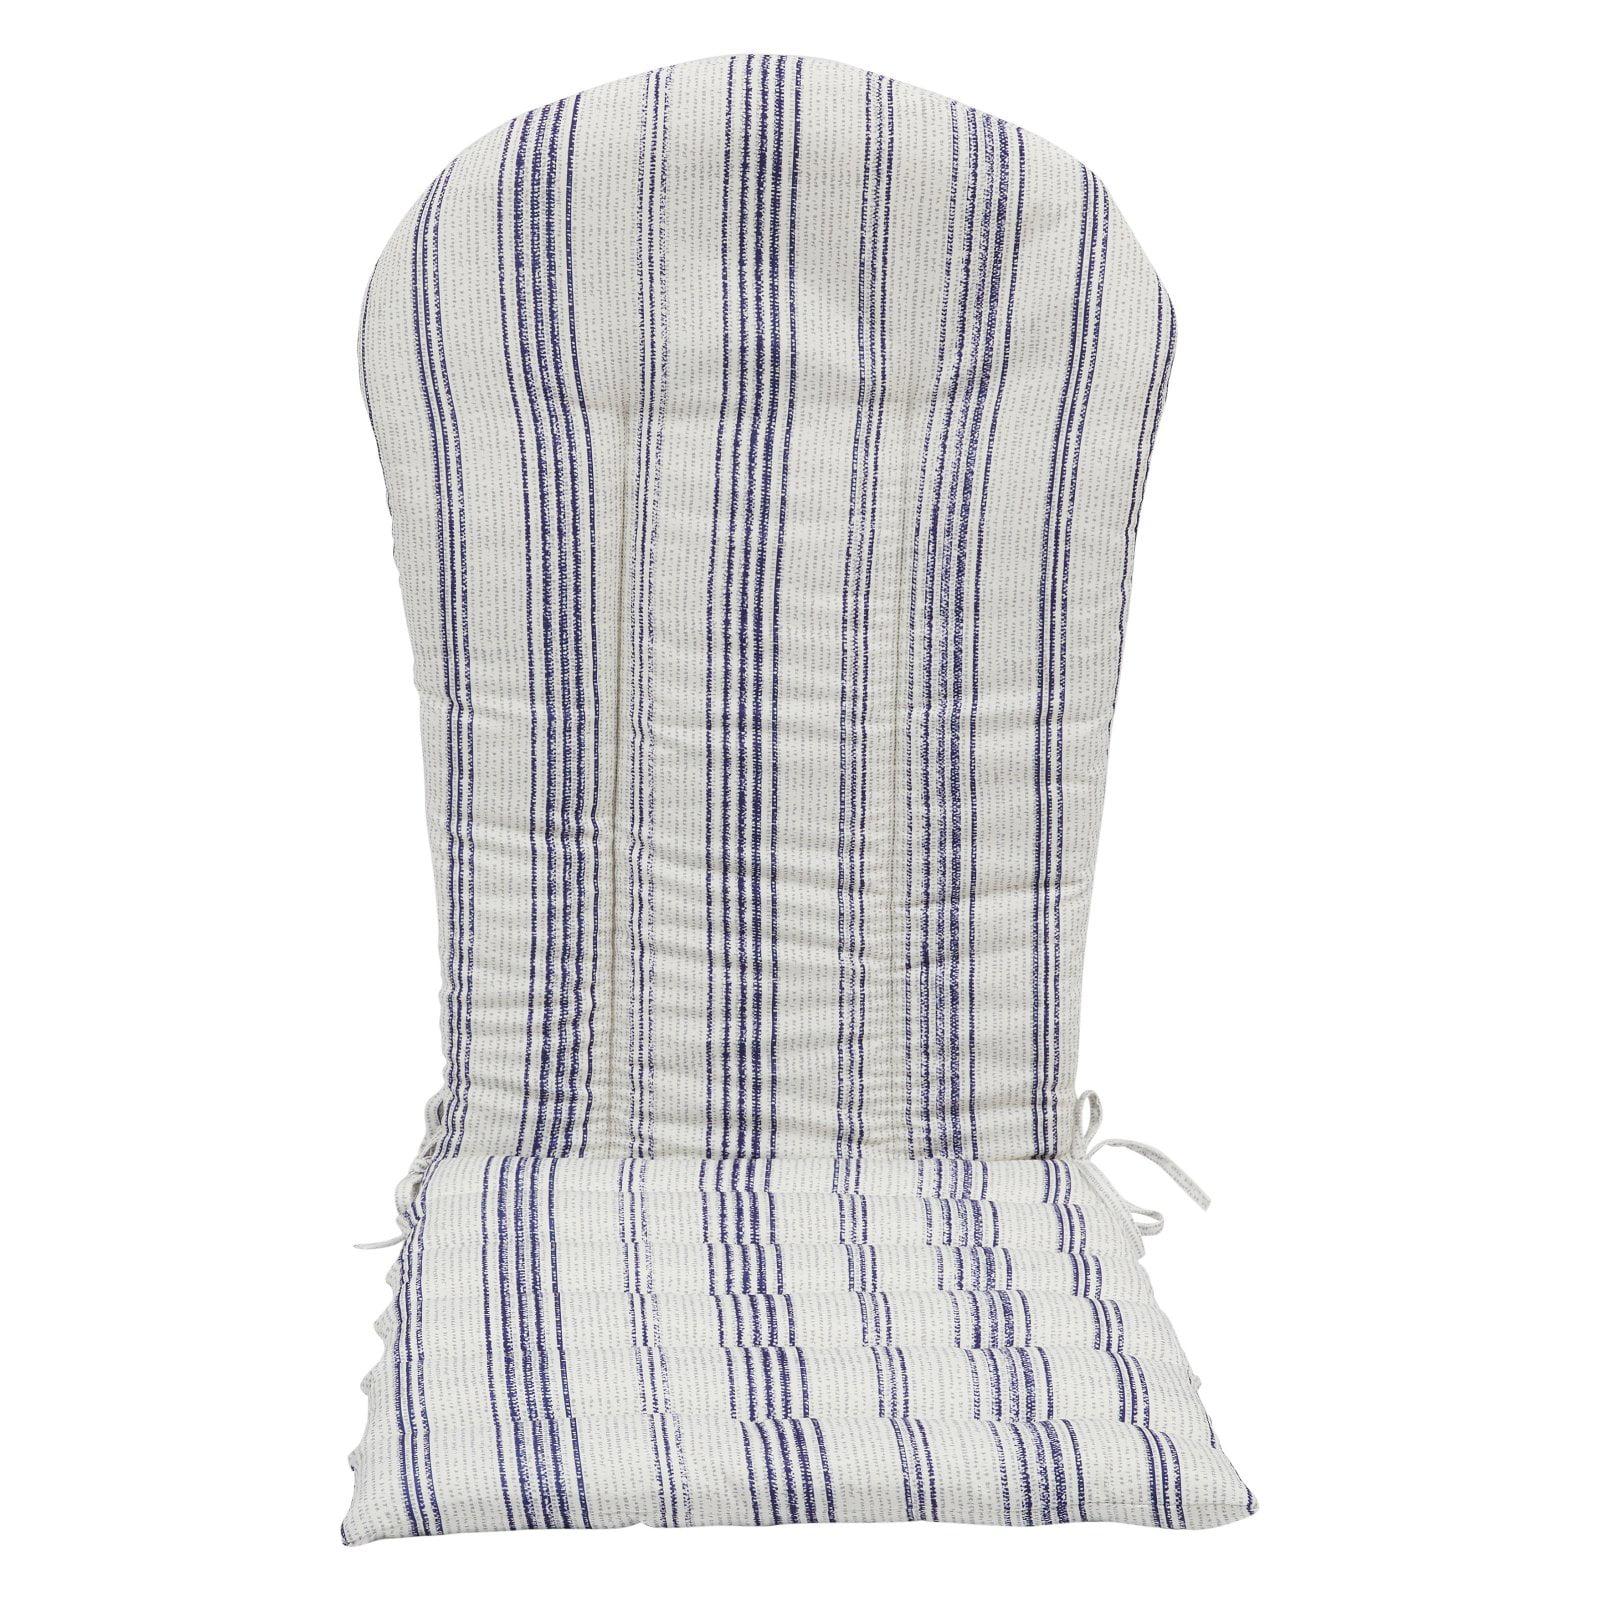 Coral Coast Beaumont Ridge Pink and Cream Adirondack Chair Cushion